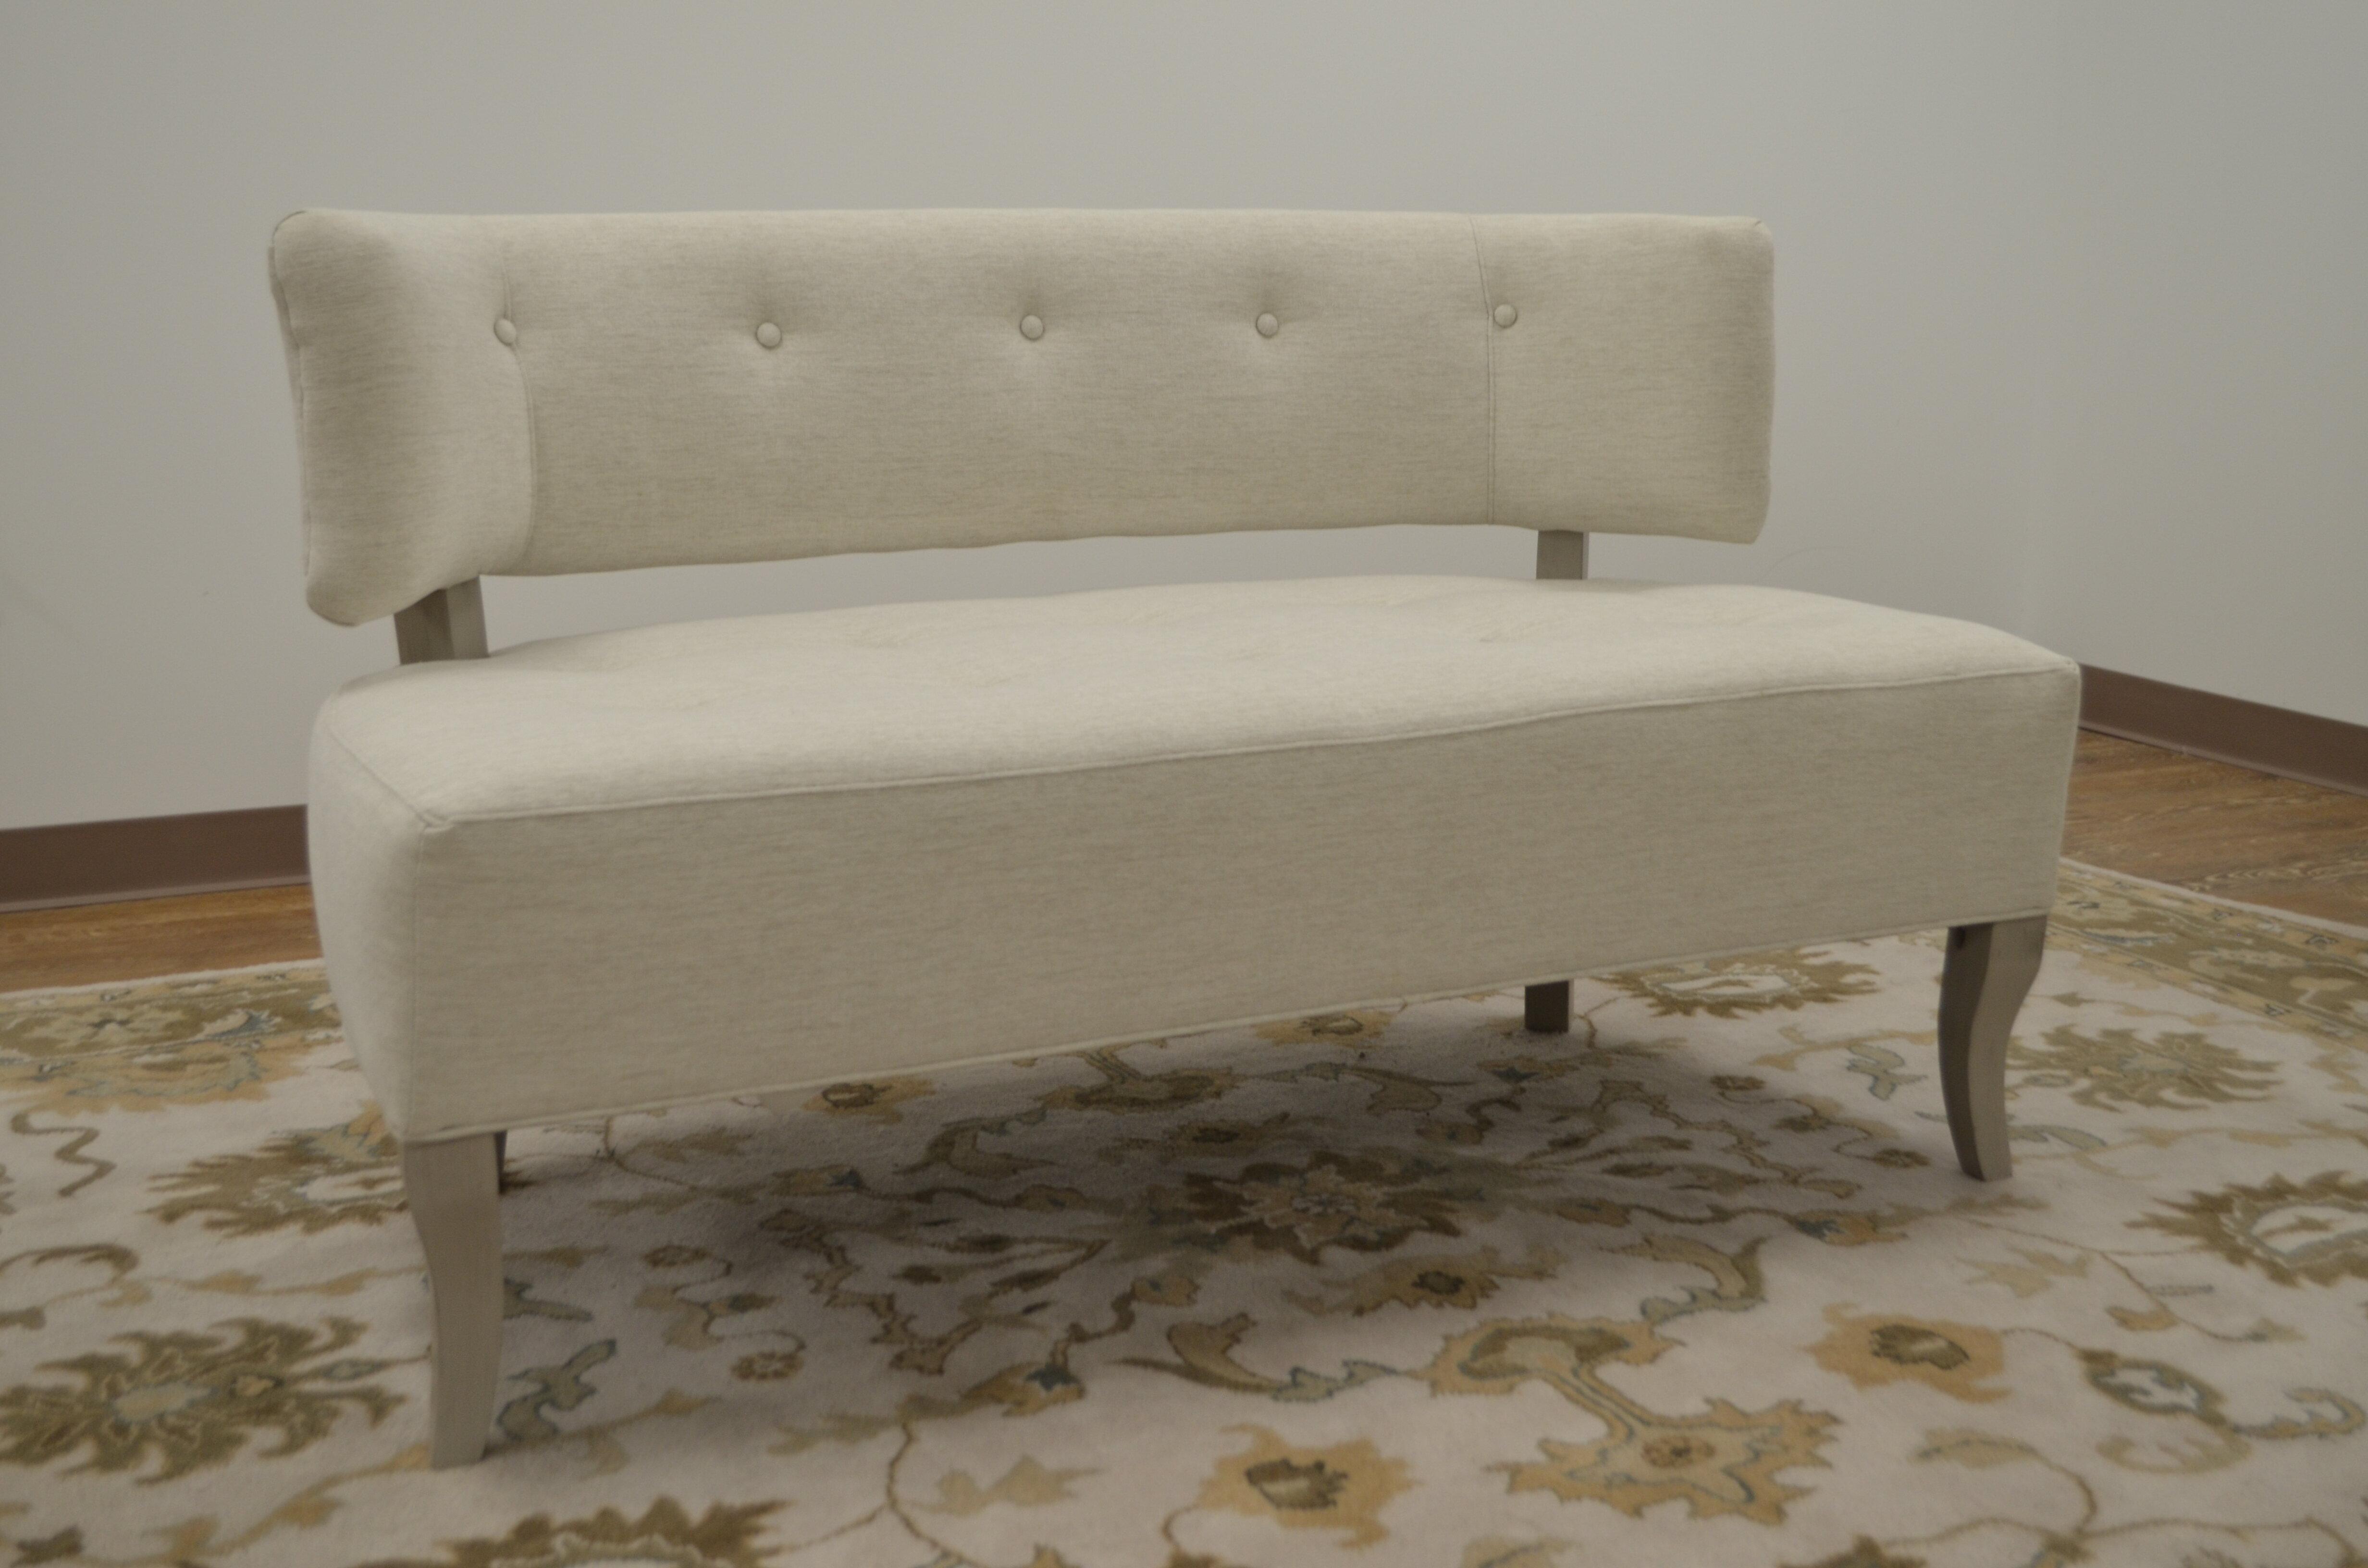 Settee Upholstered Bedroom Bench